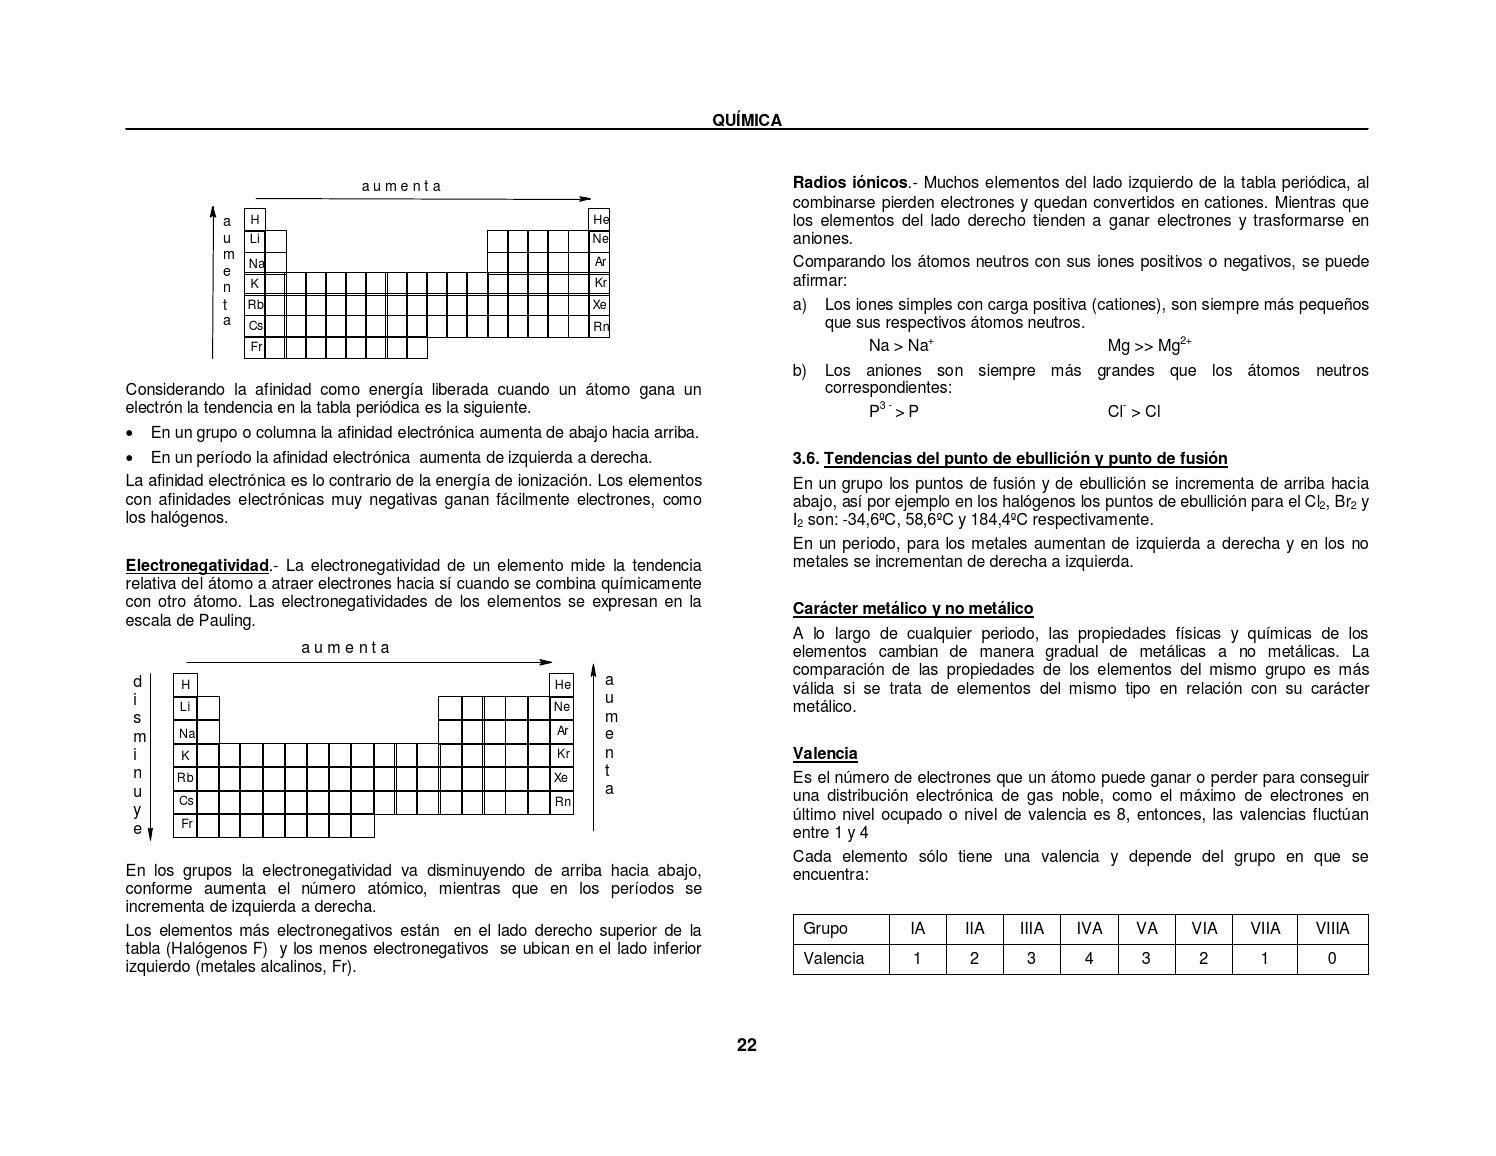 Solucionario de quimica excelente by arnoldo romero issuu urtaz Gallery